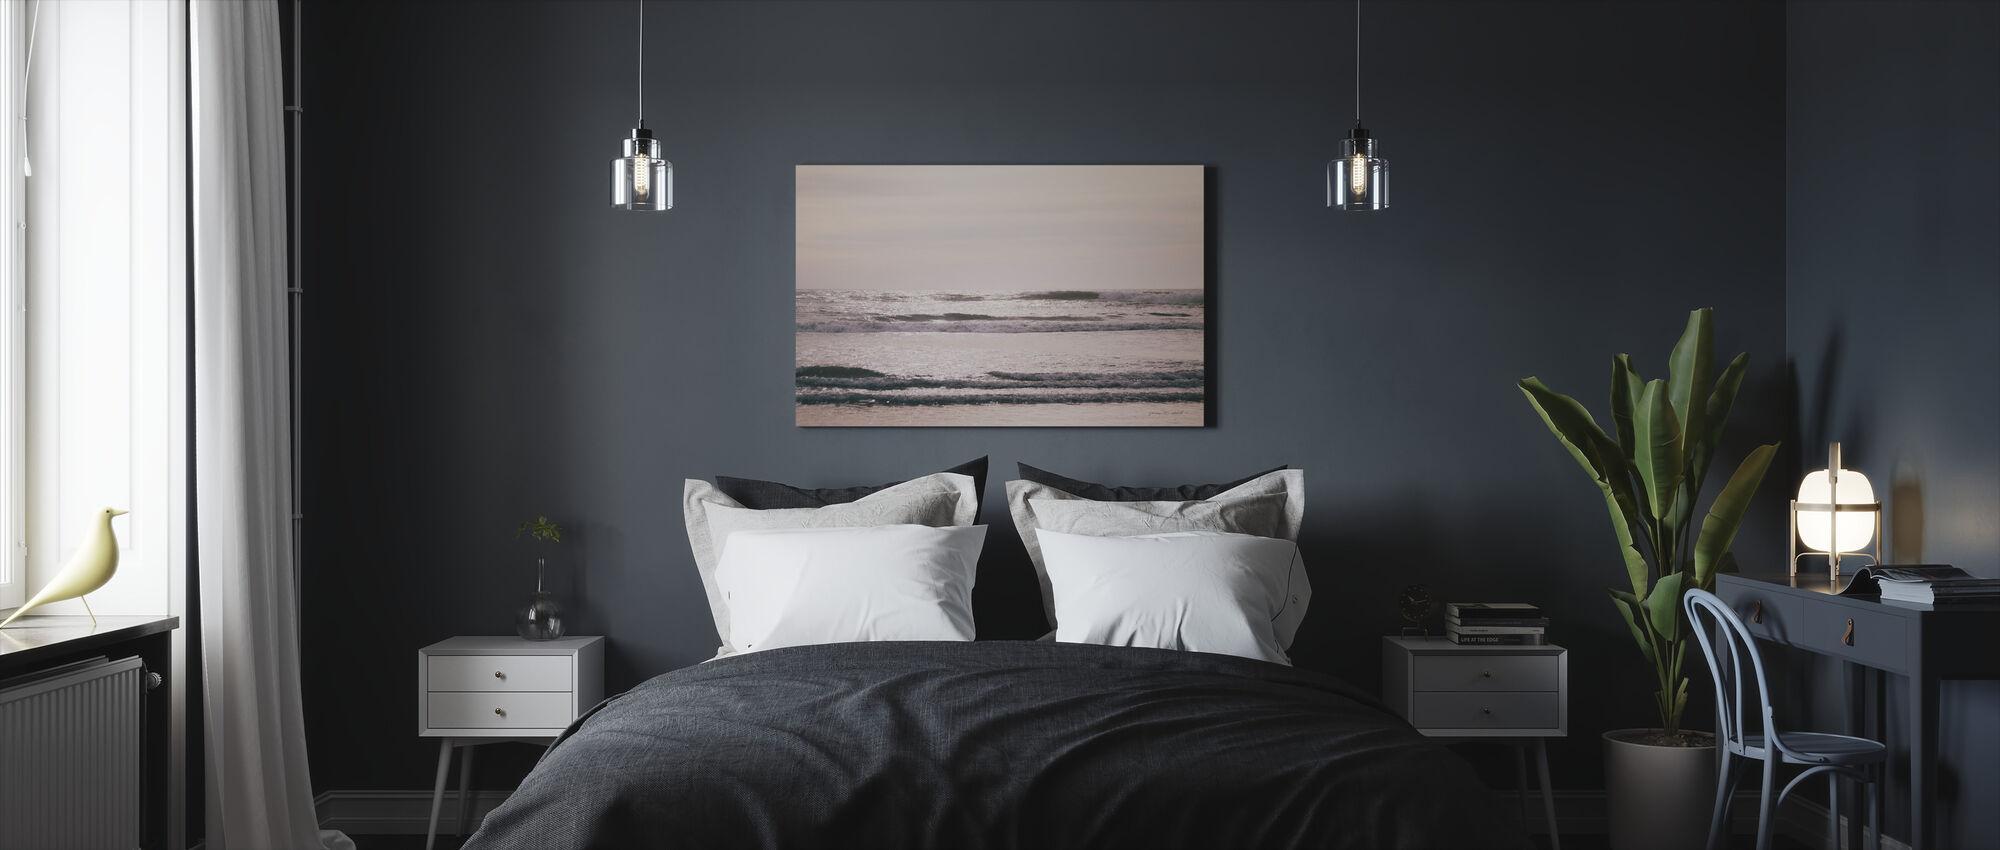 Kalaloch-kust - Canvas print - Slaapkamer